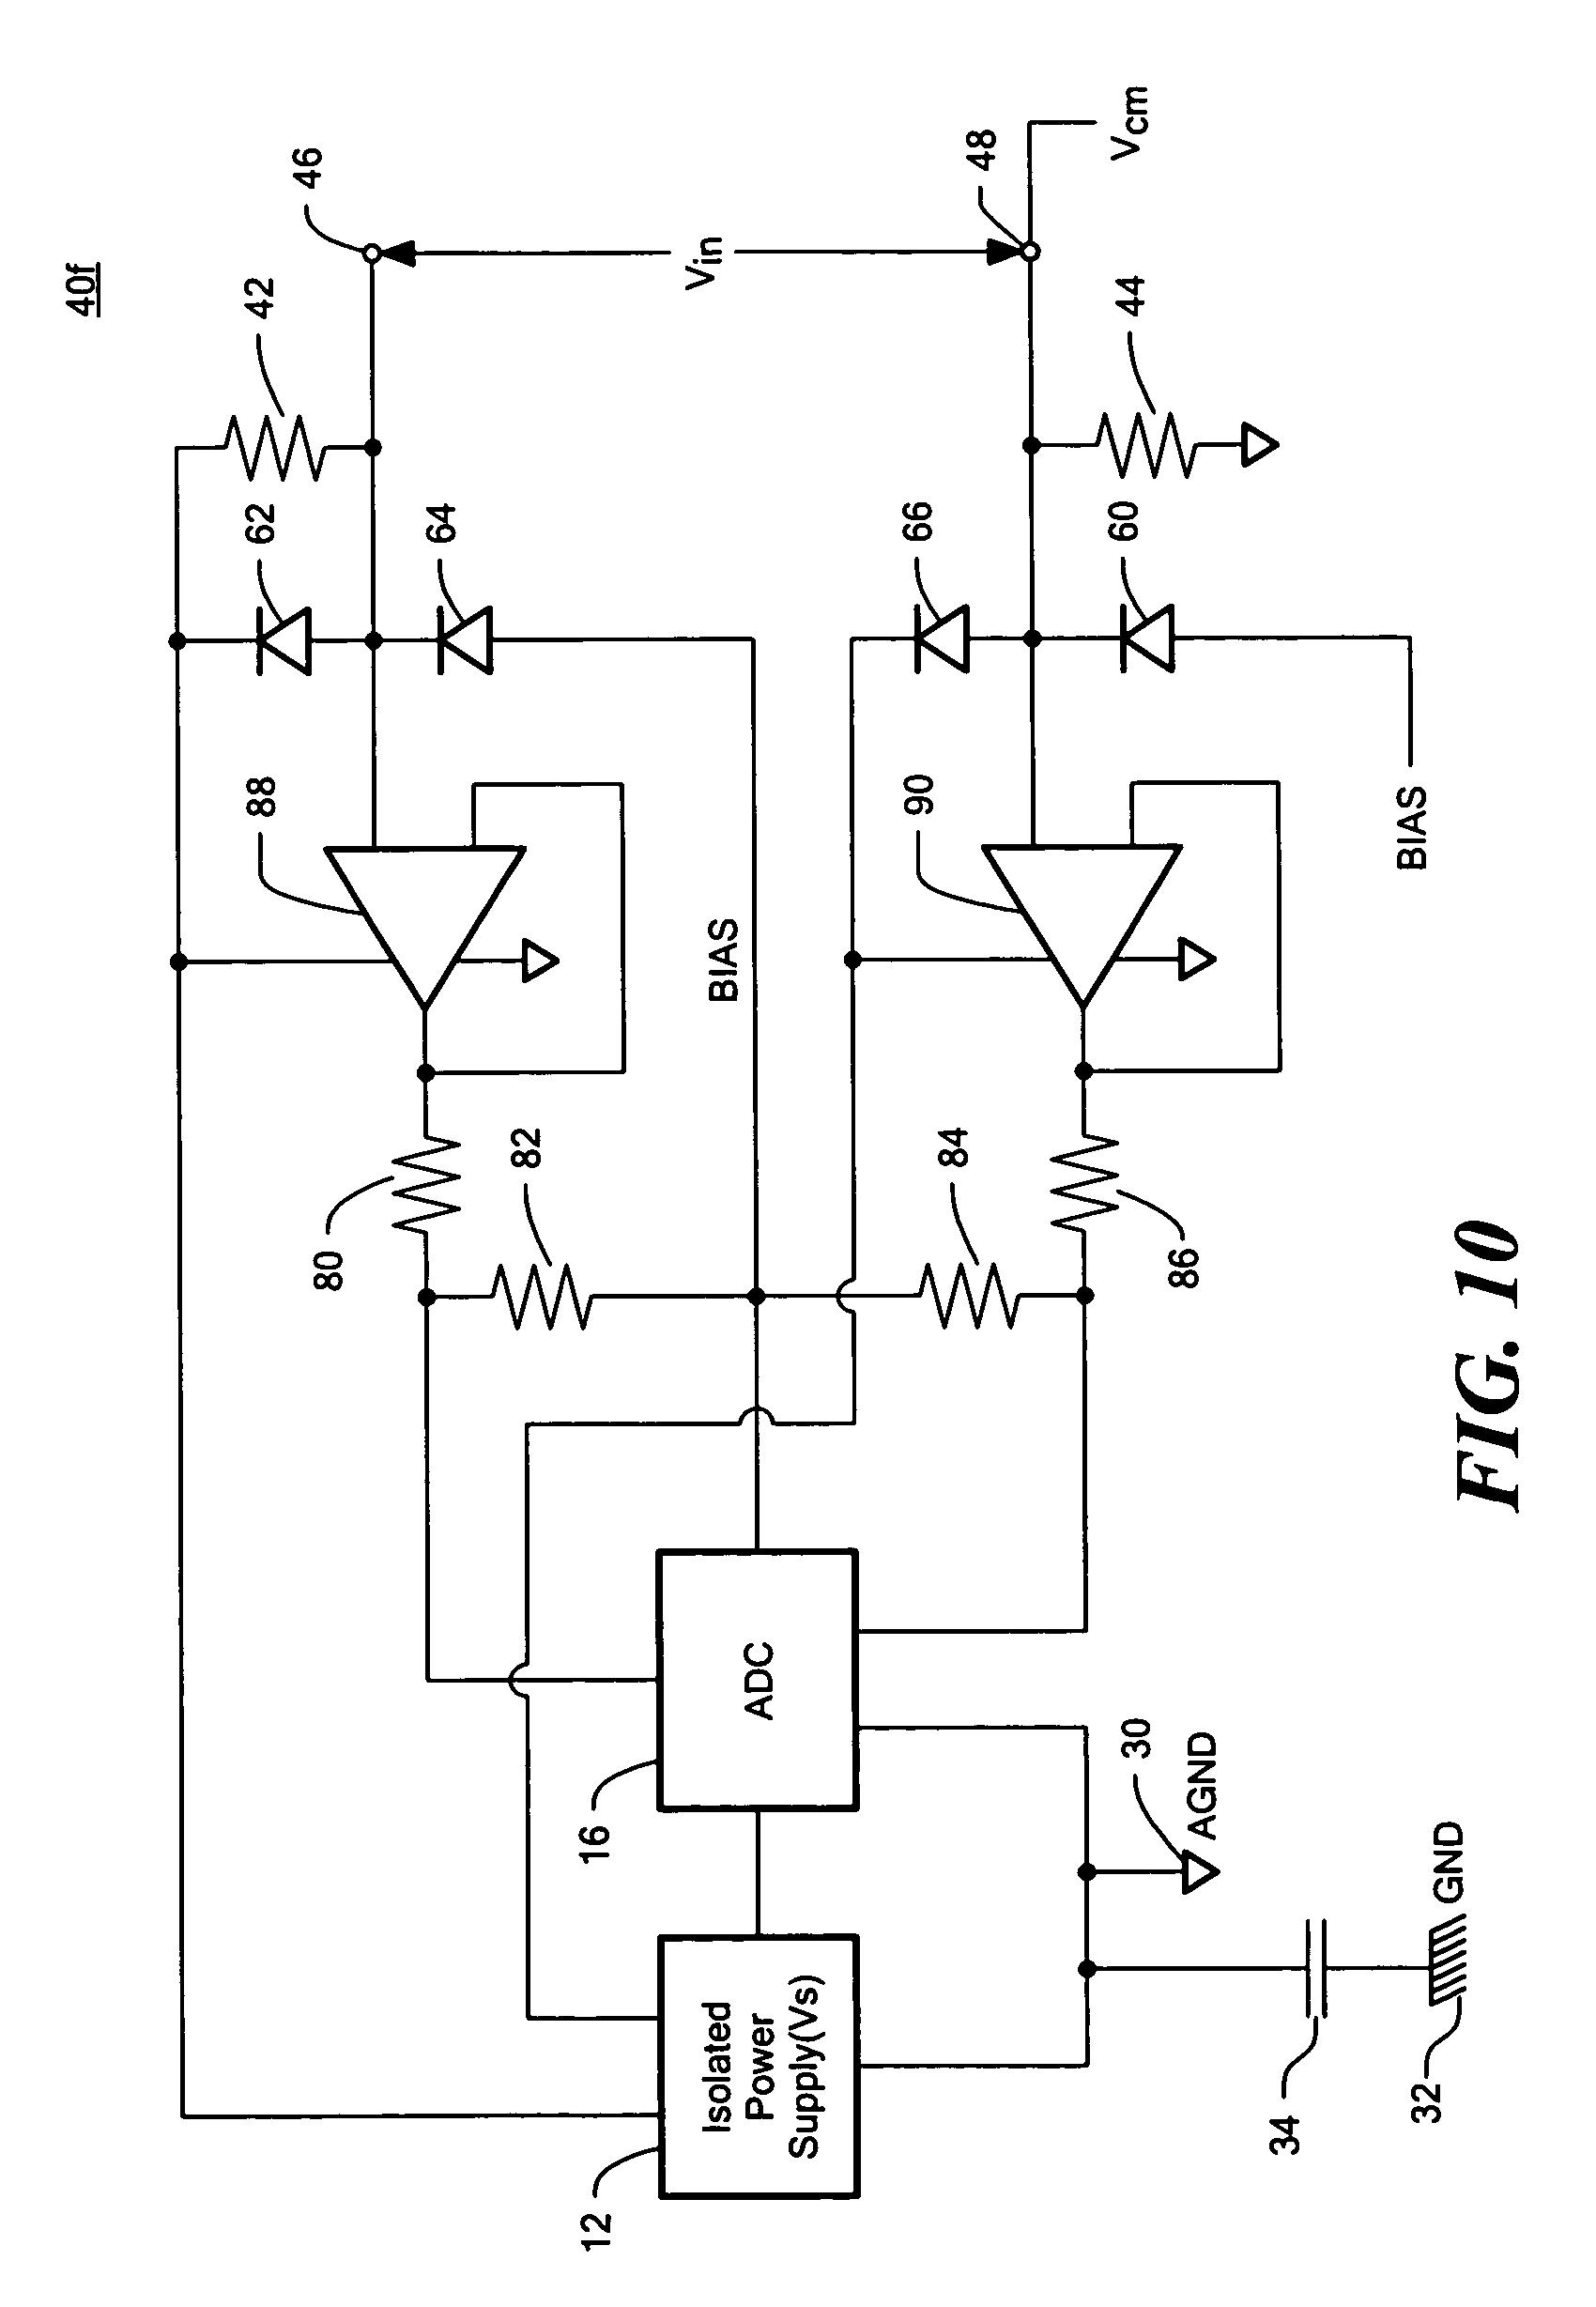 1756 if6i wiring diagram polaris sportsman ir6i if8